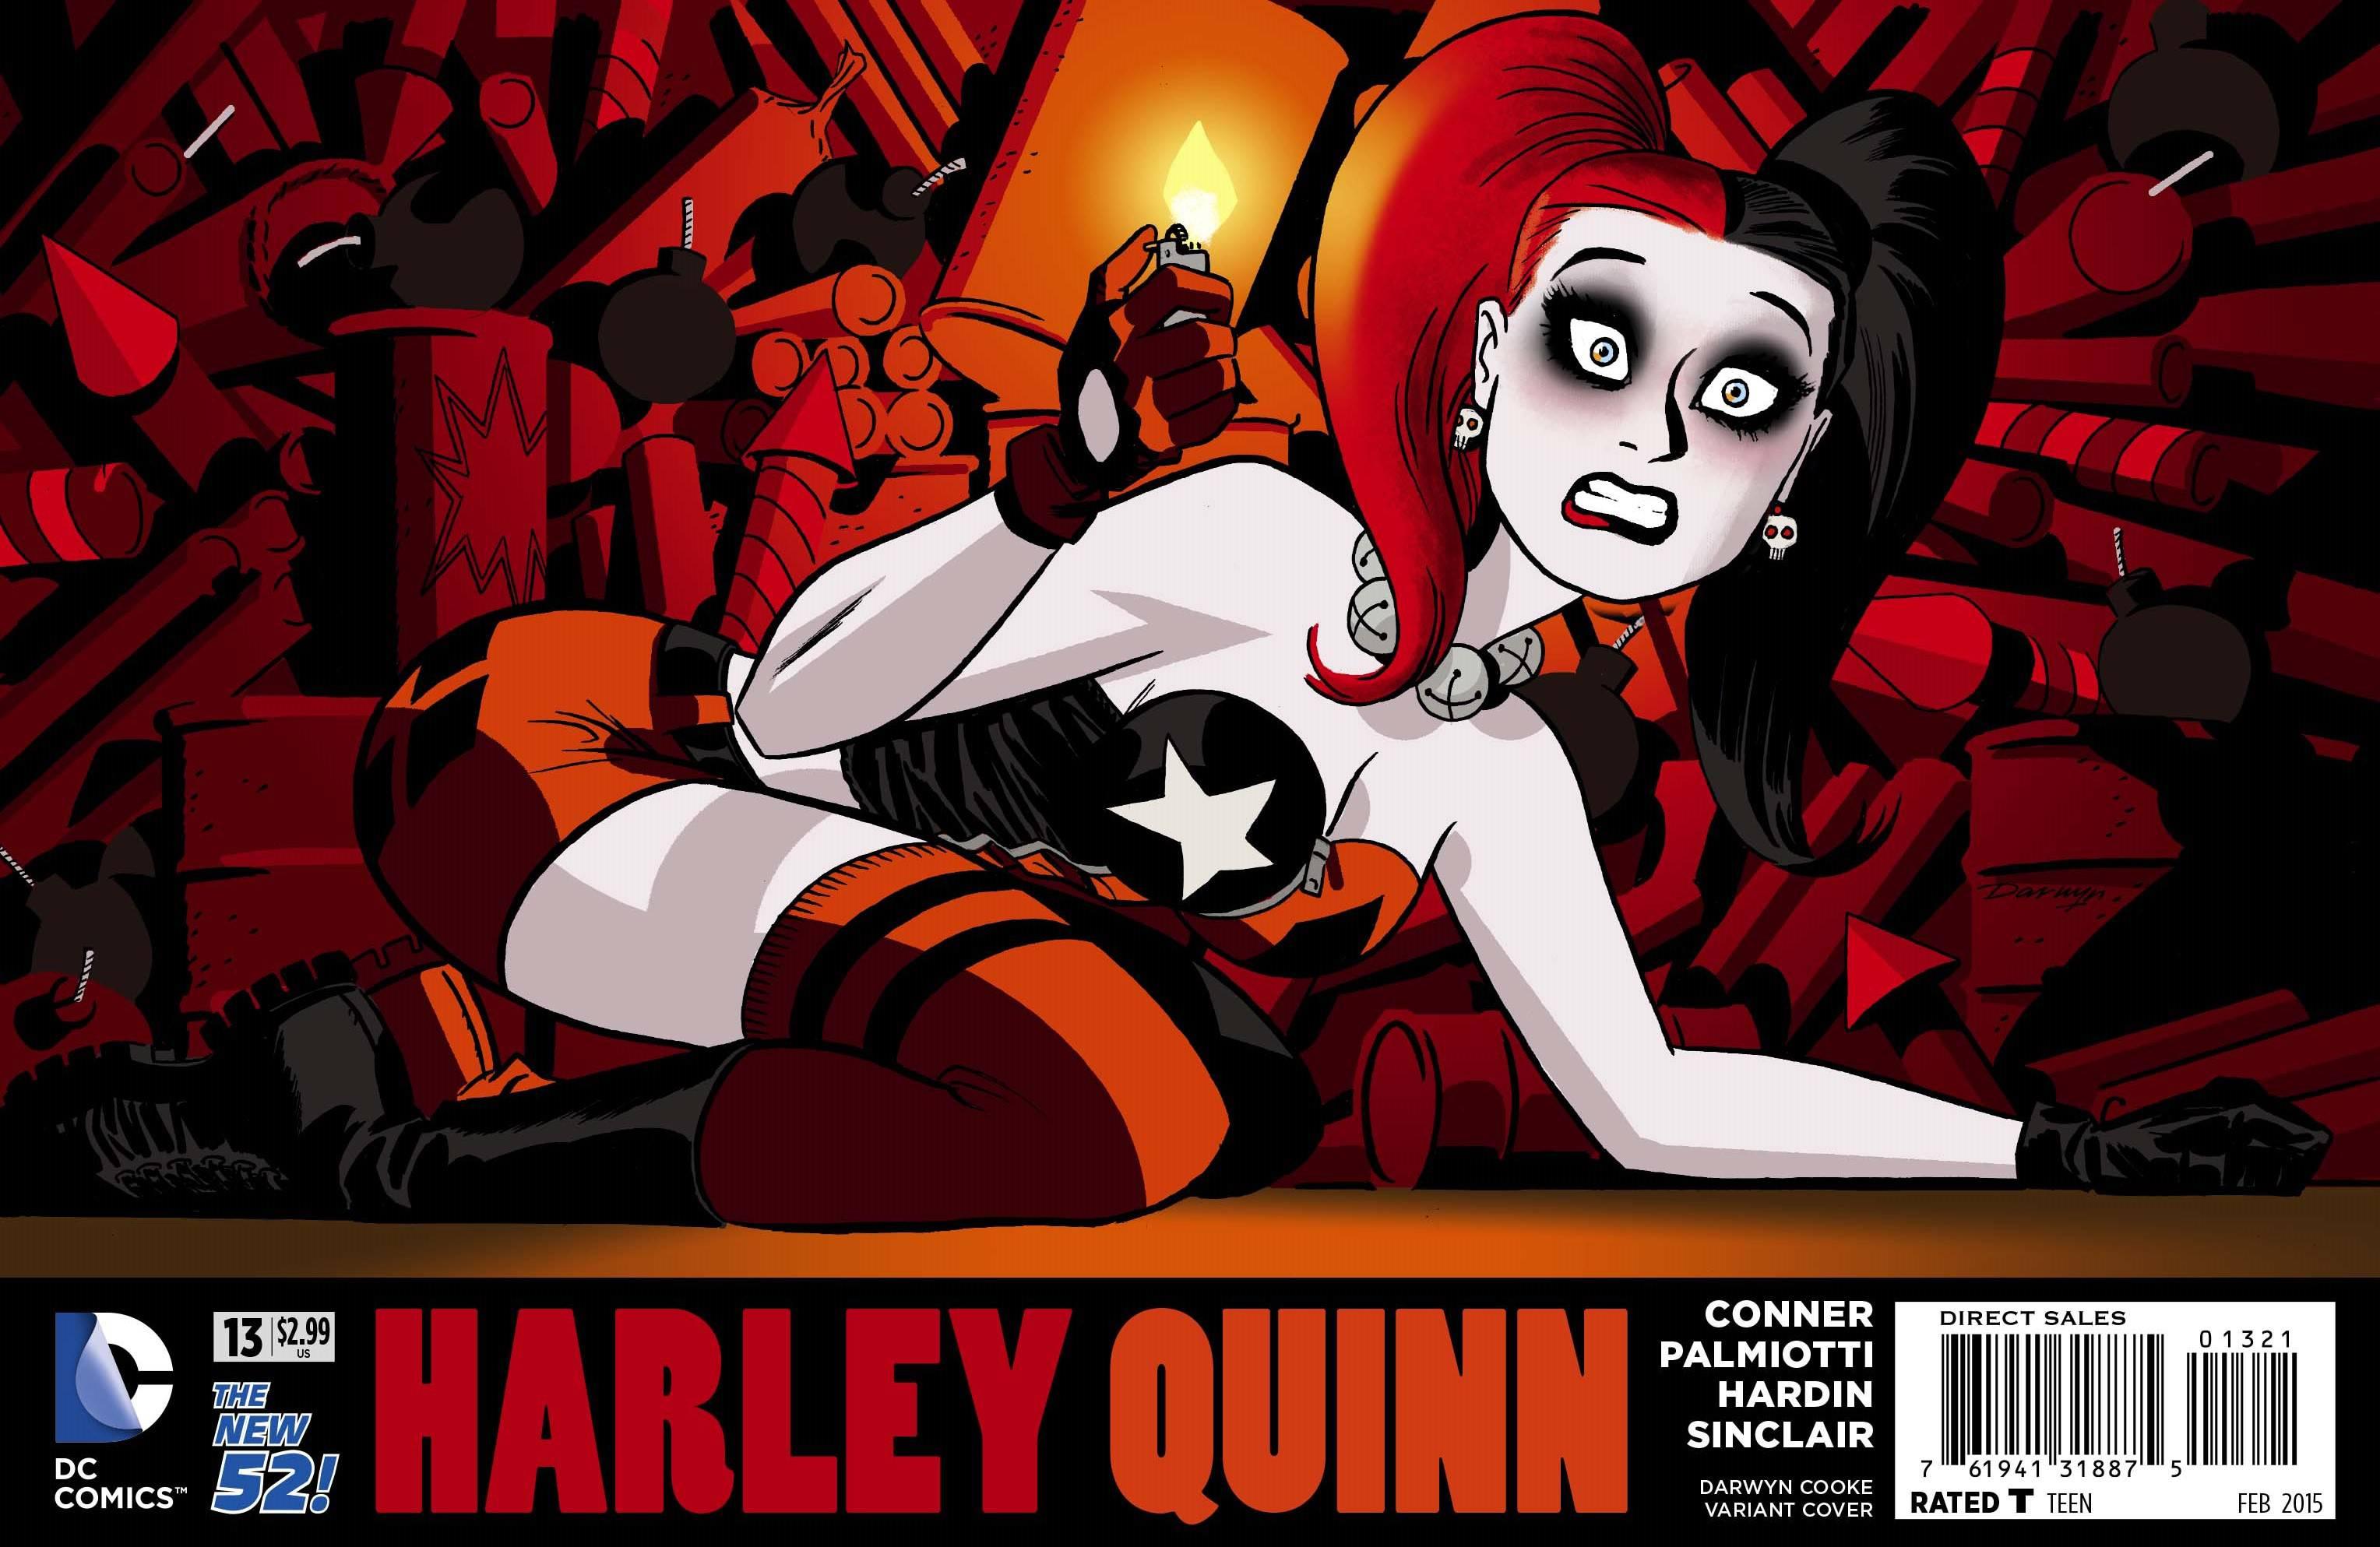 Harley Quinn Vol 2 13 Cooke Variant.jpg